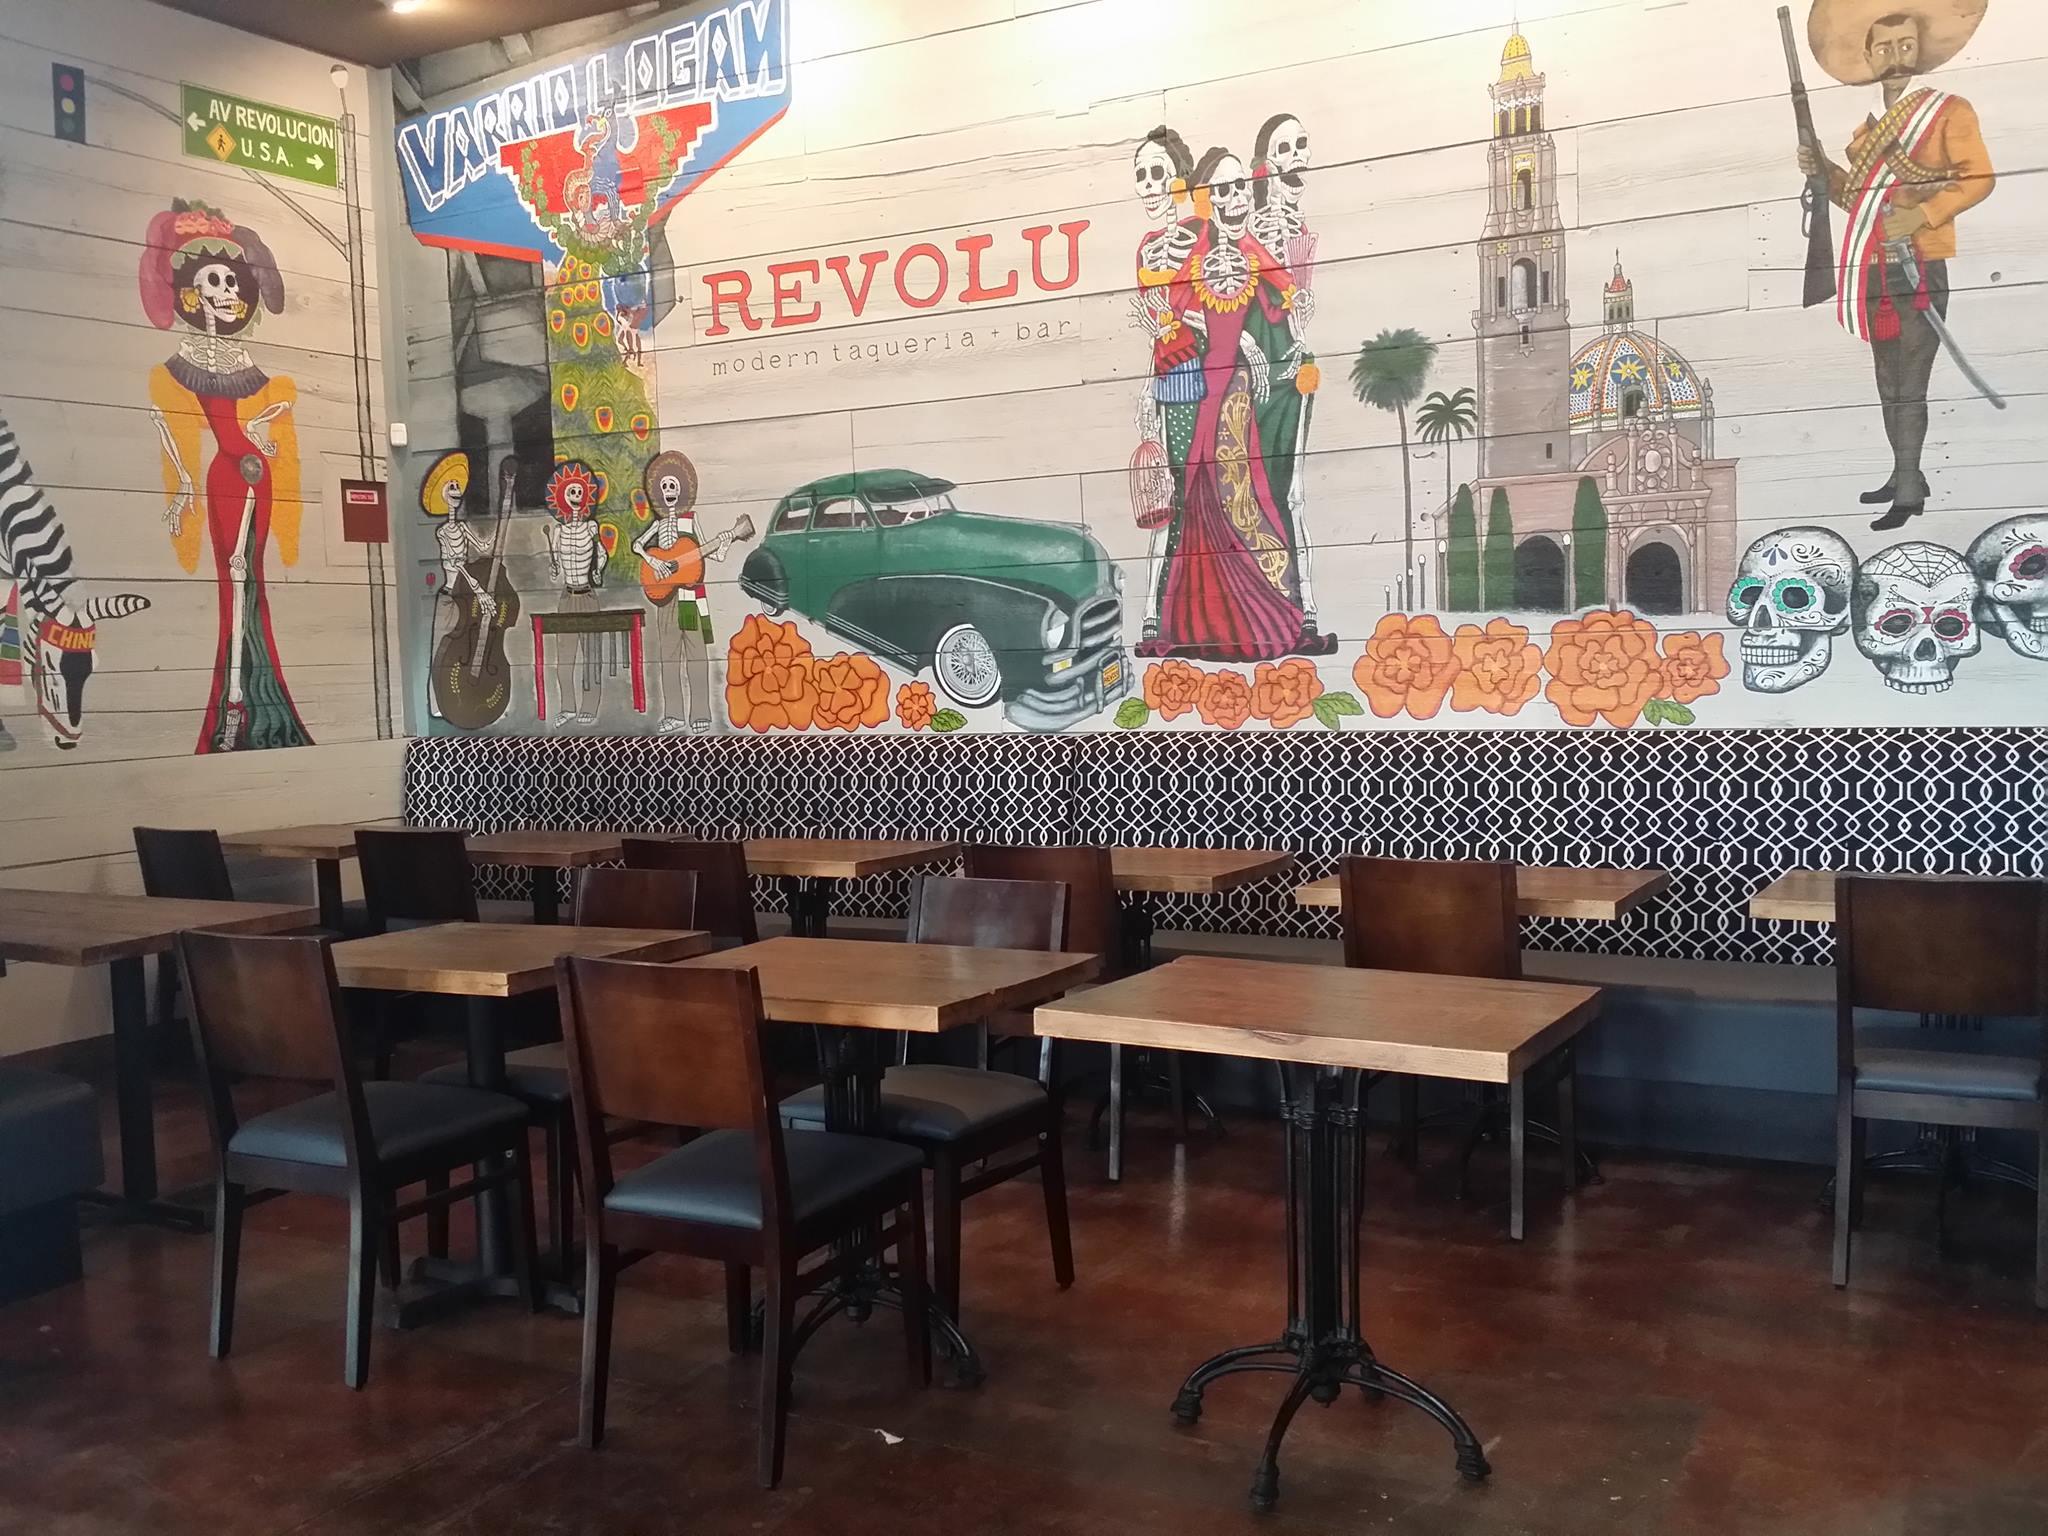 Client Spotlight - Revolu Modern Taqueria & Bar